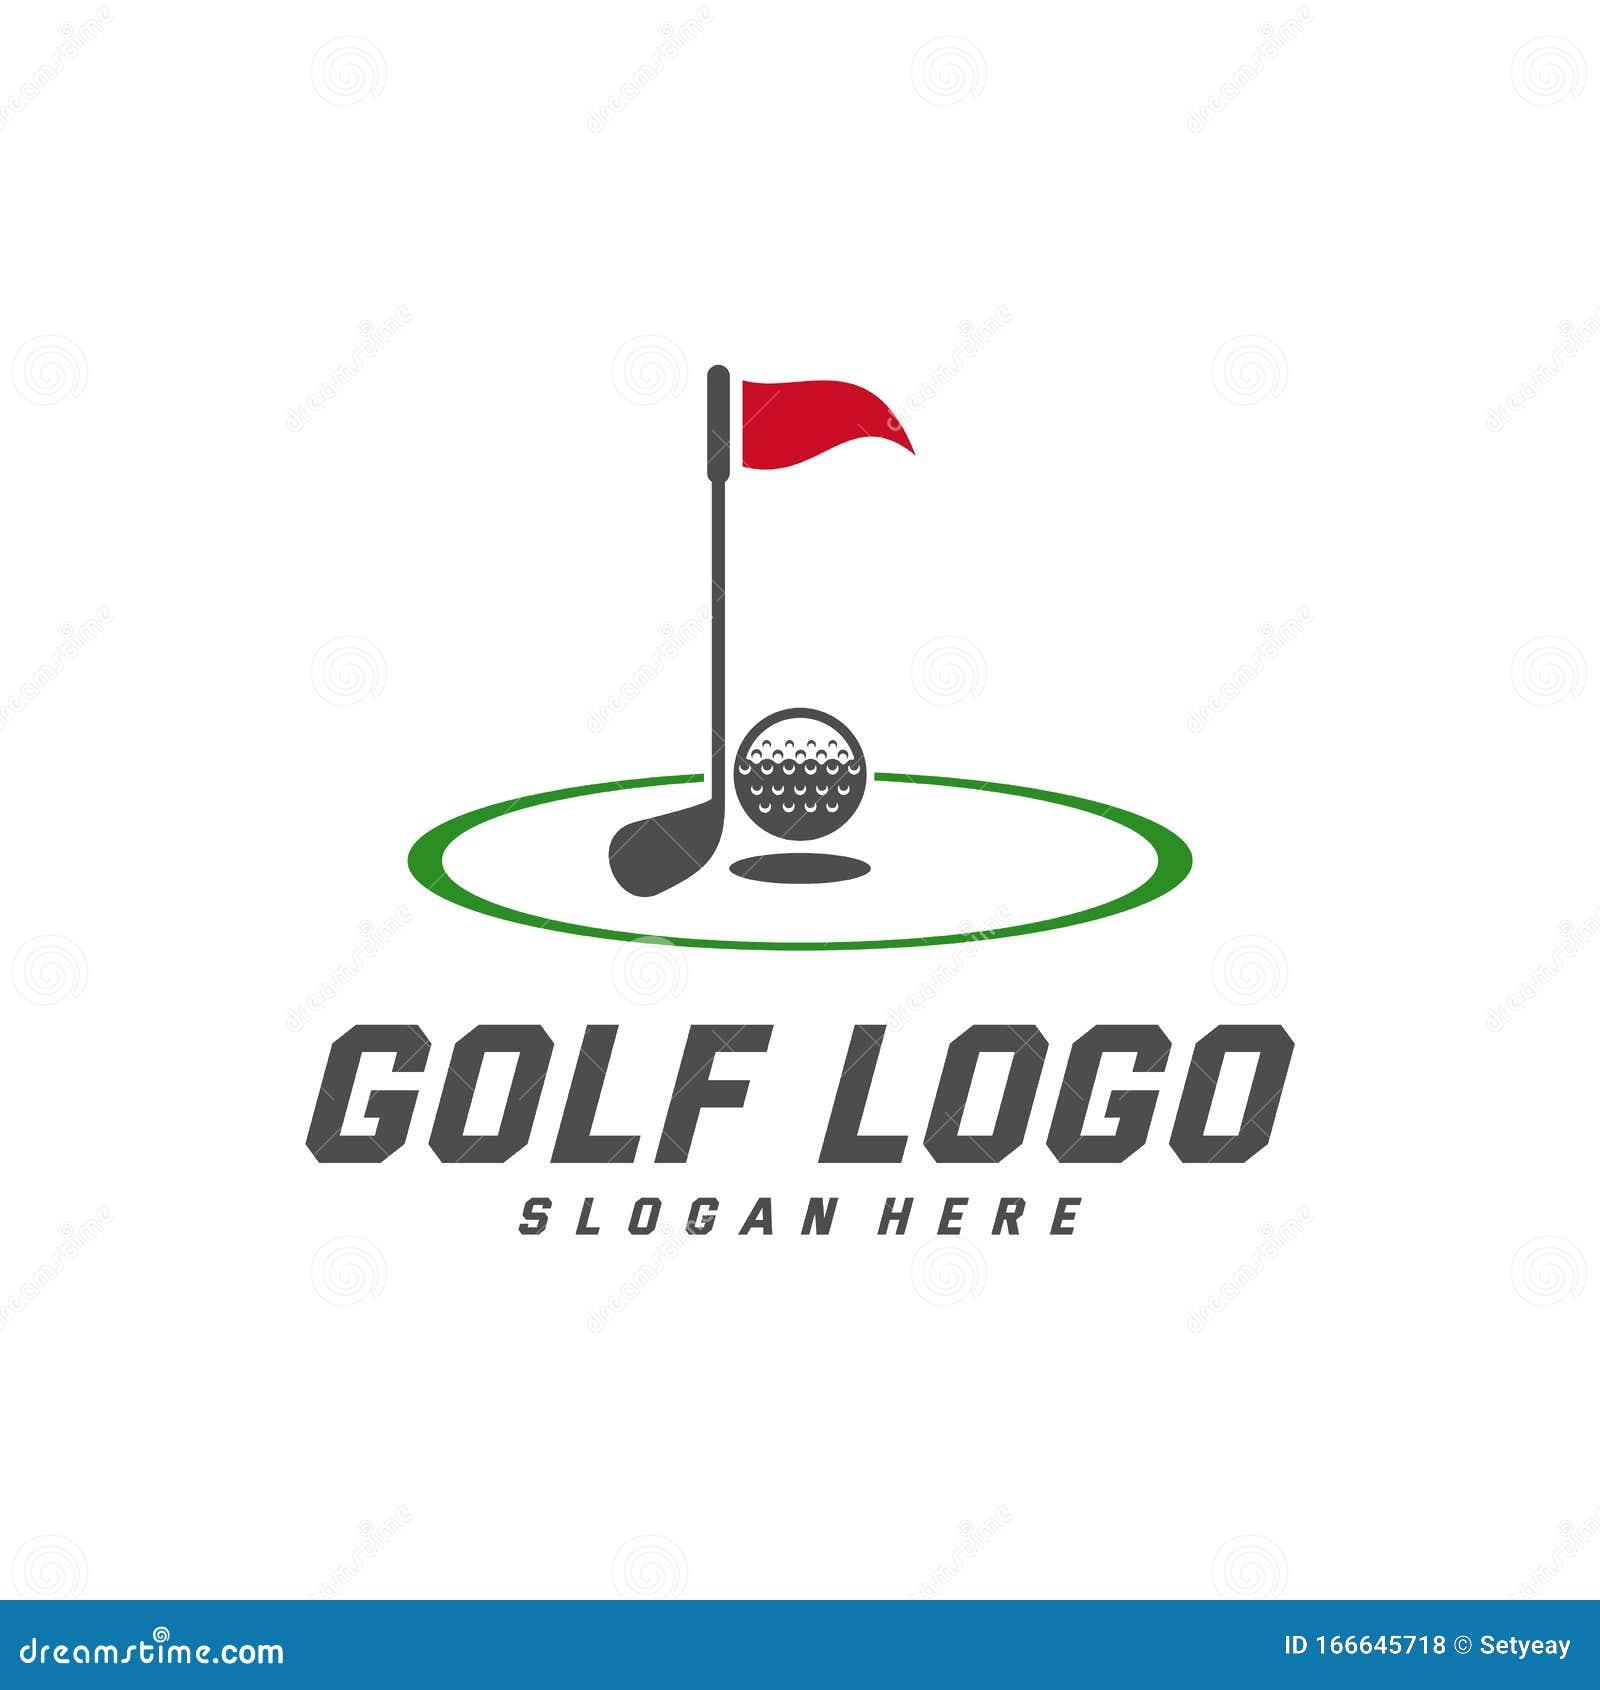 Golf Logo Design Vector Template Vector Label Of Golf Logo Of Golf Championship Illustration Creative Icon Design Concept Stock Vector Illustration Of Label Ball 166645718